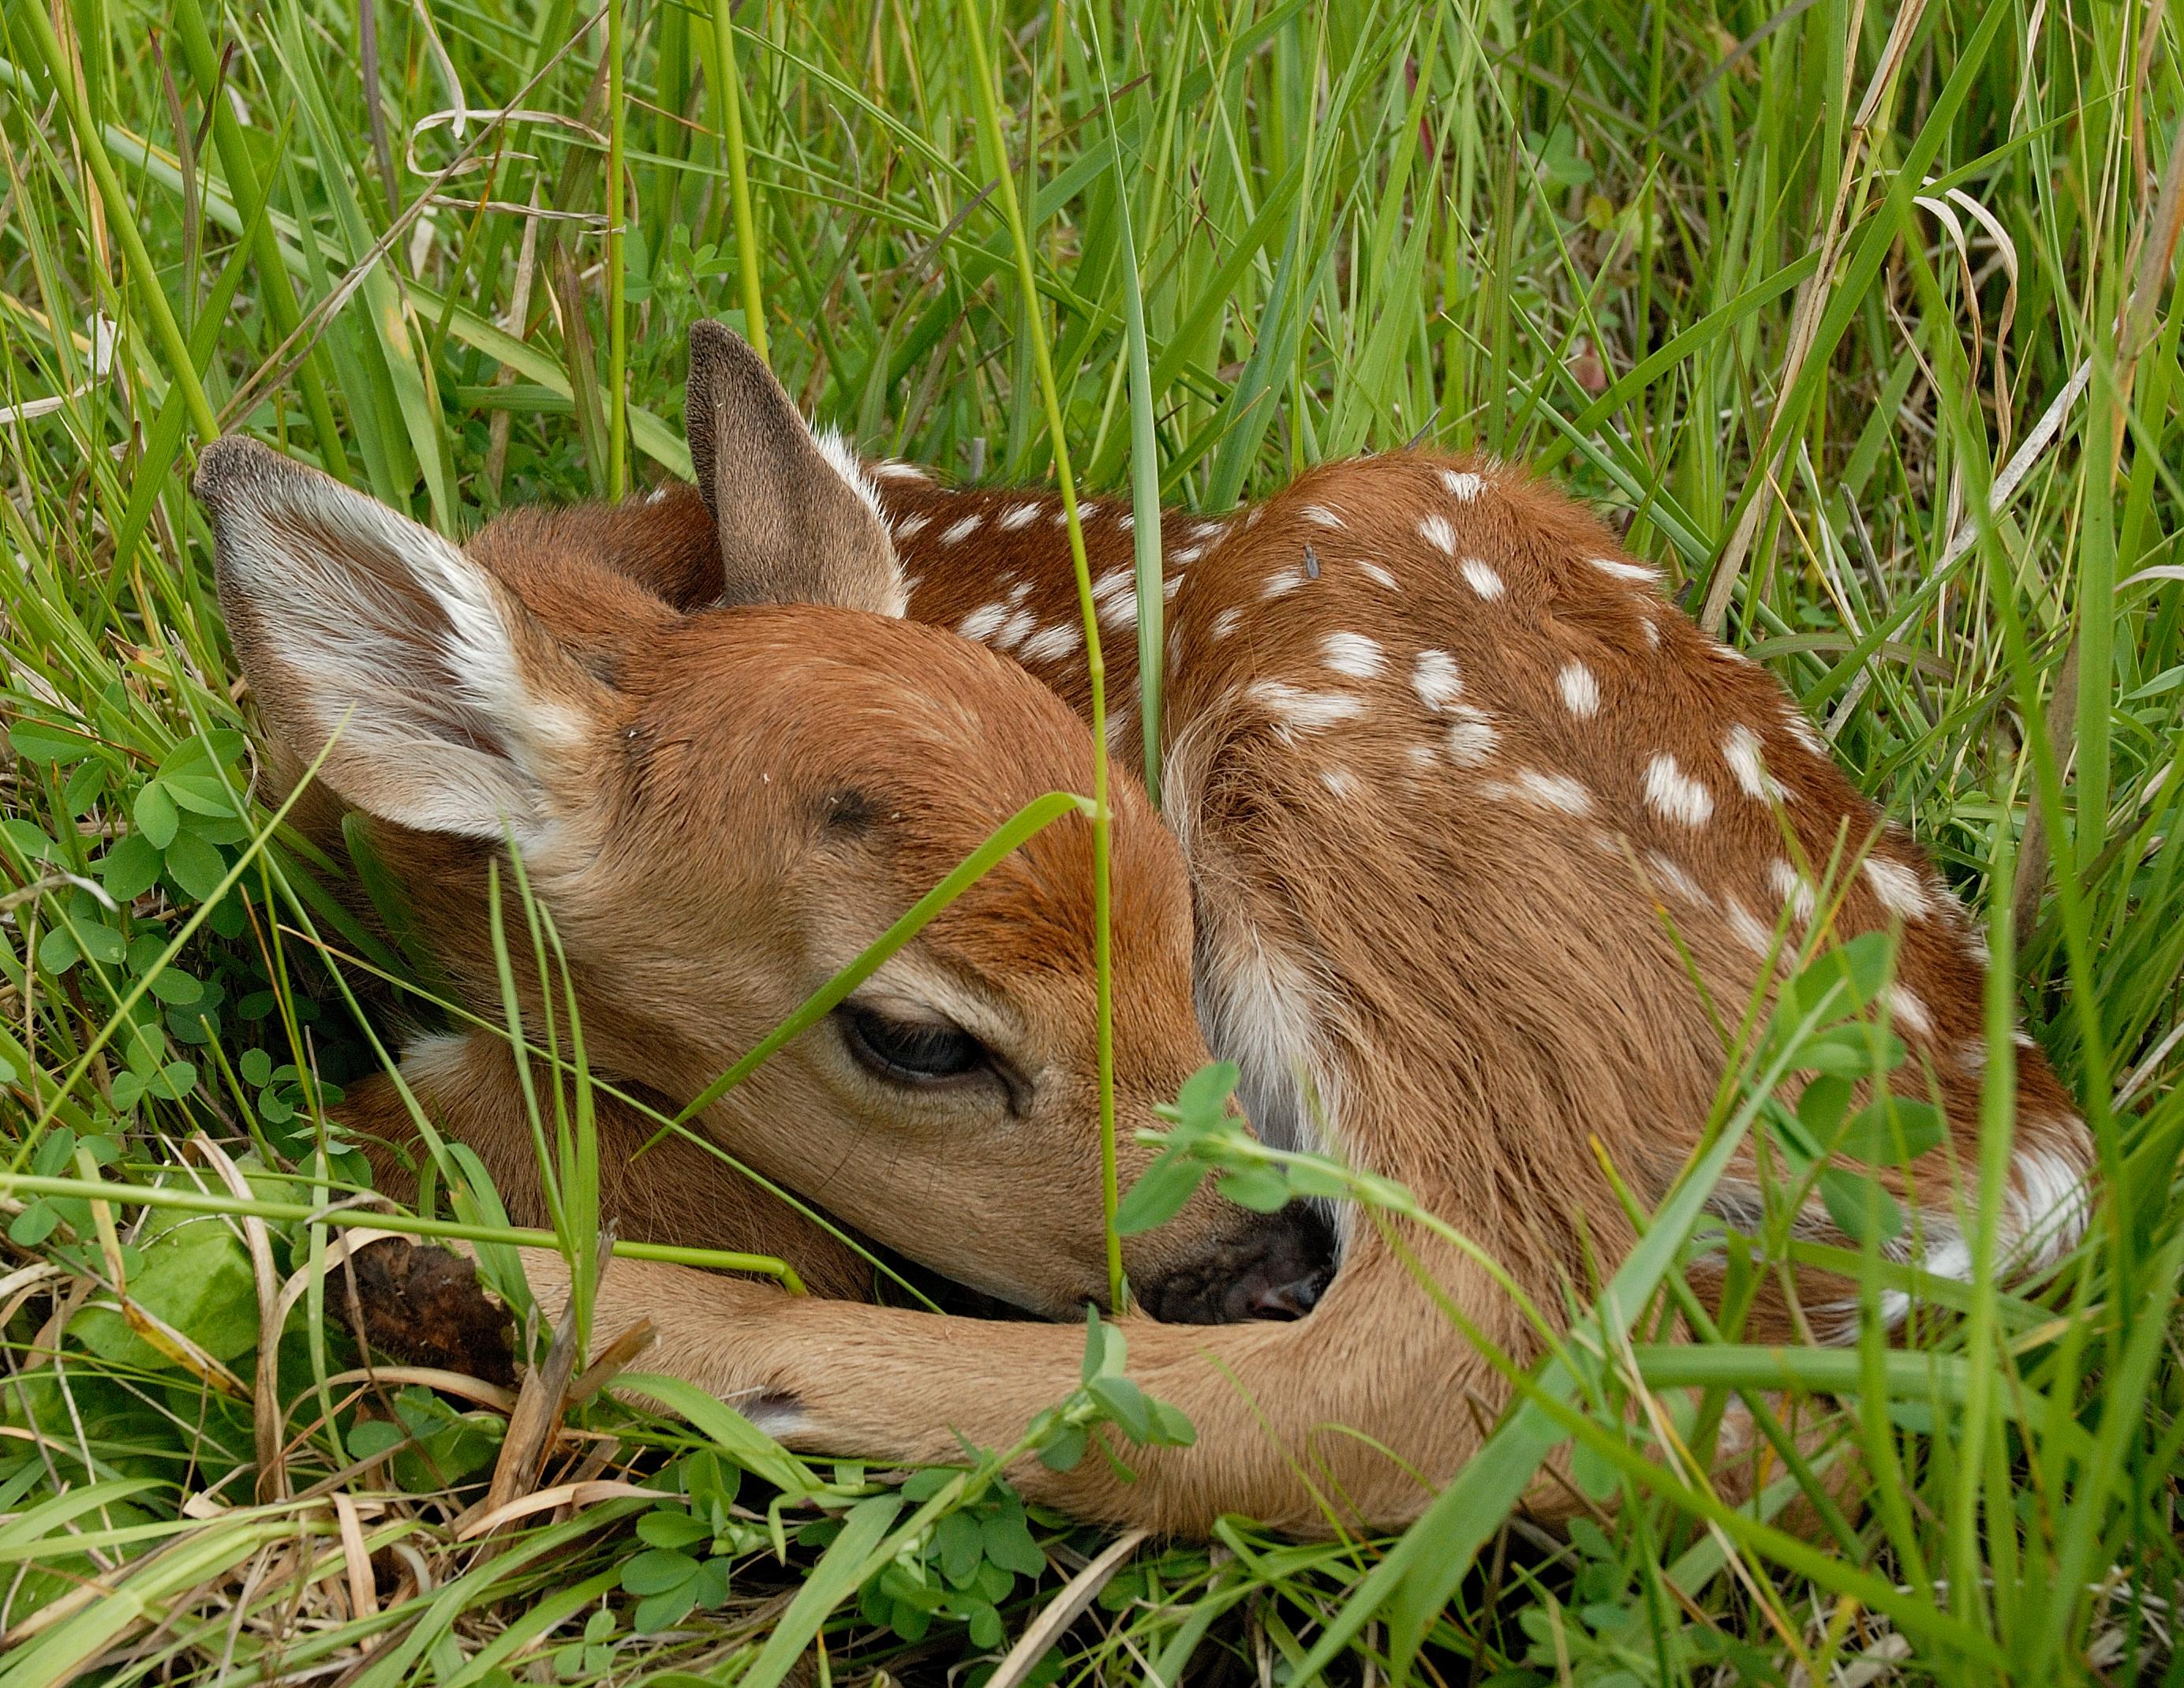 deer chesapeake ohio canal national historical park u s deer fawn